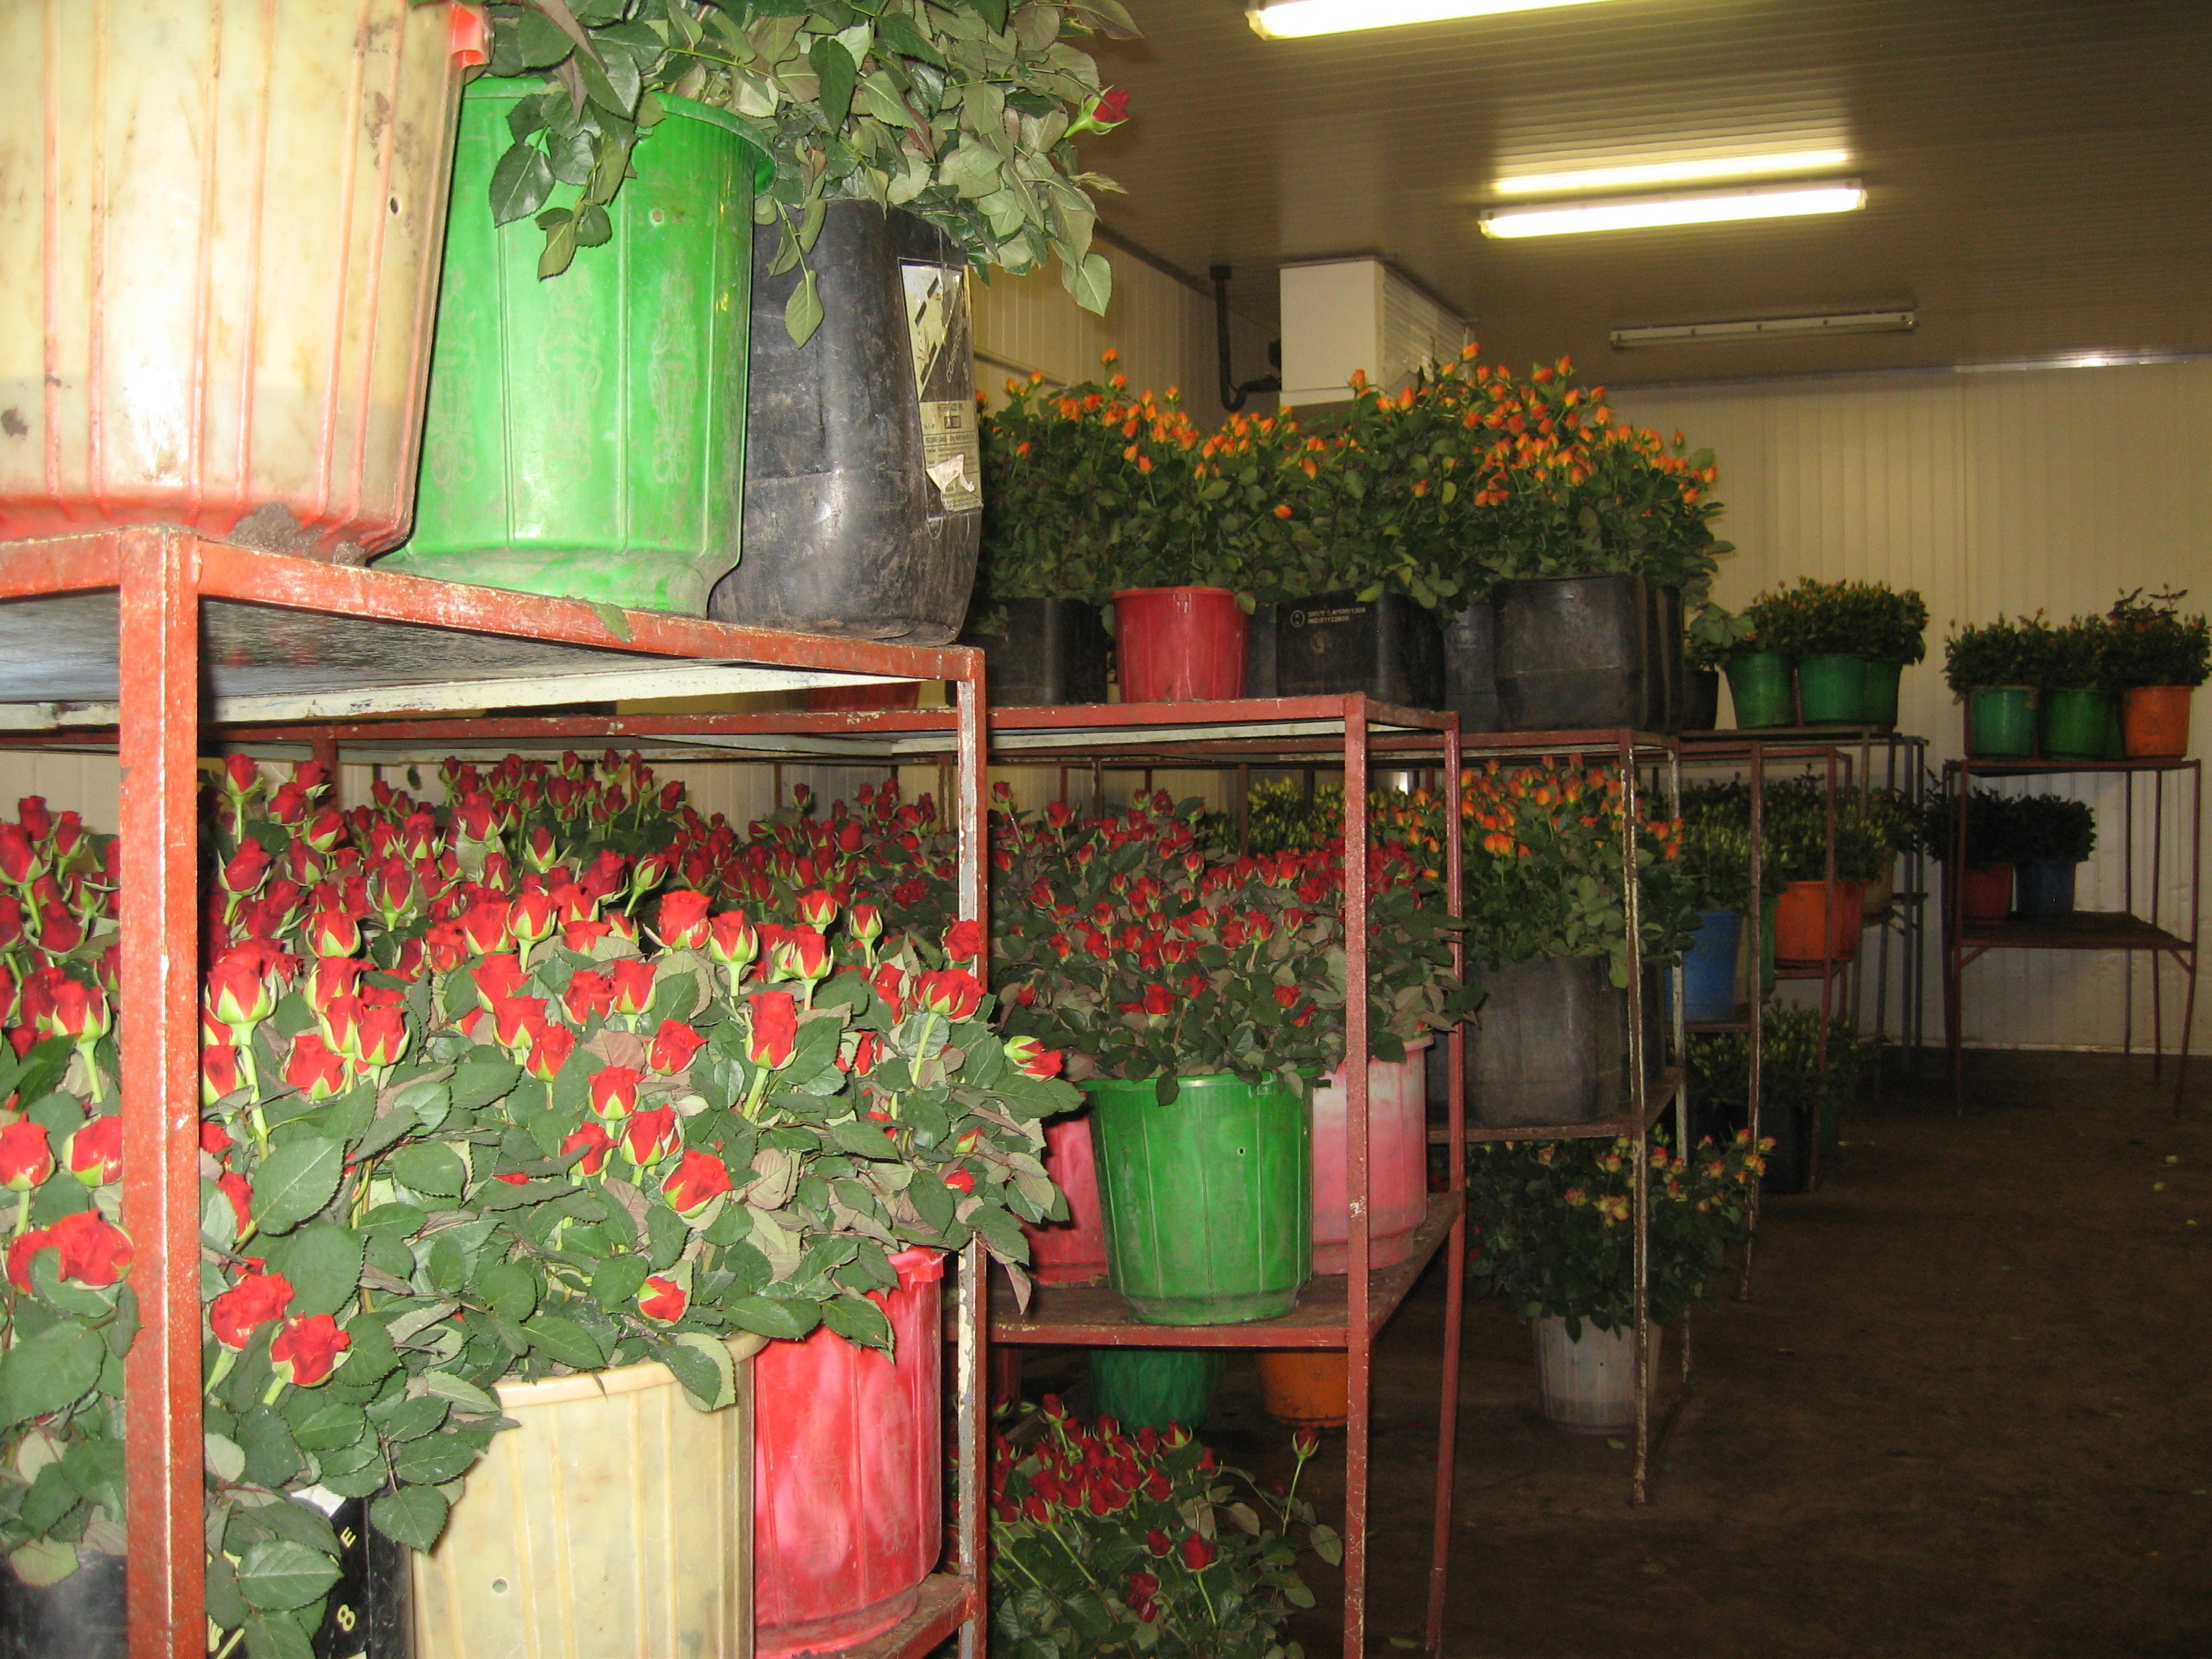 Rose storage